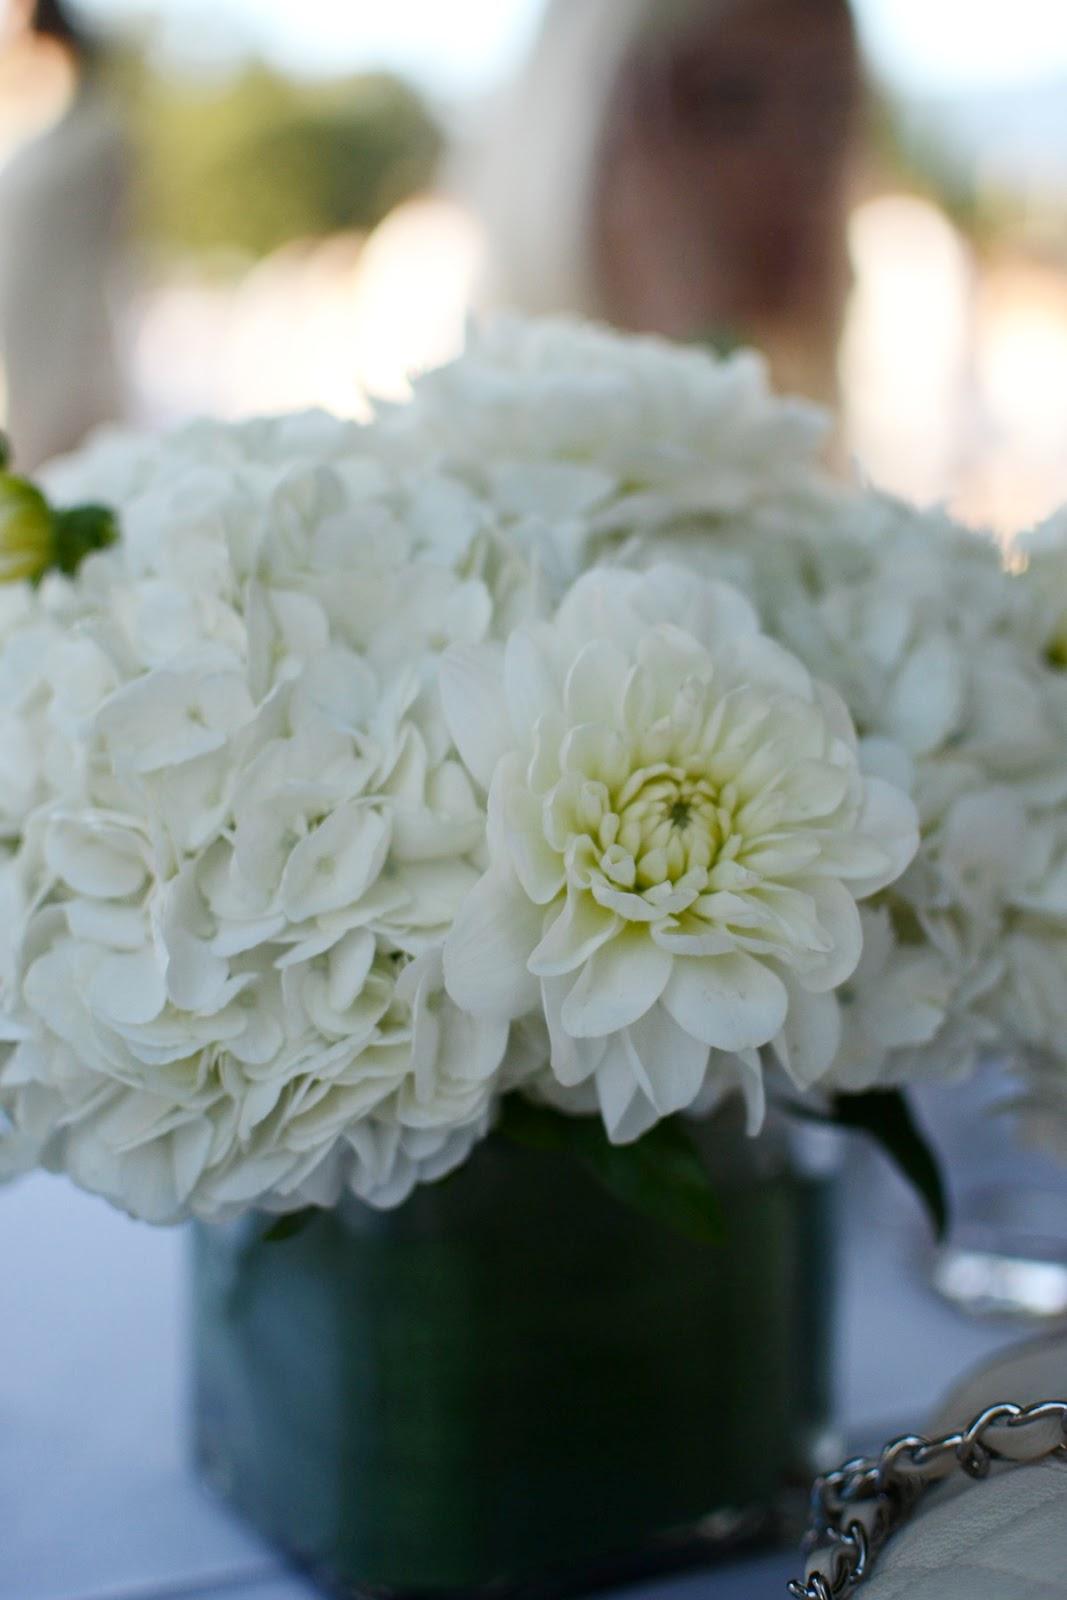 Diner en Blanc Vancouver aleesha harris floral arrangement